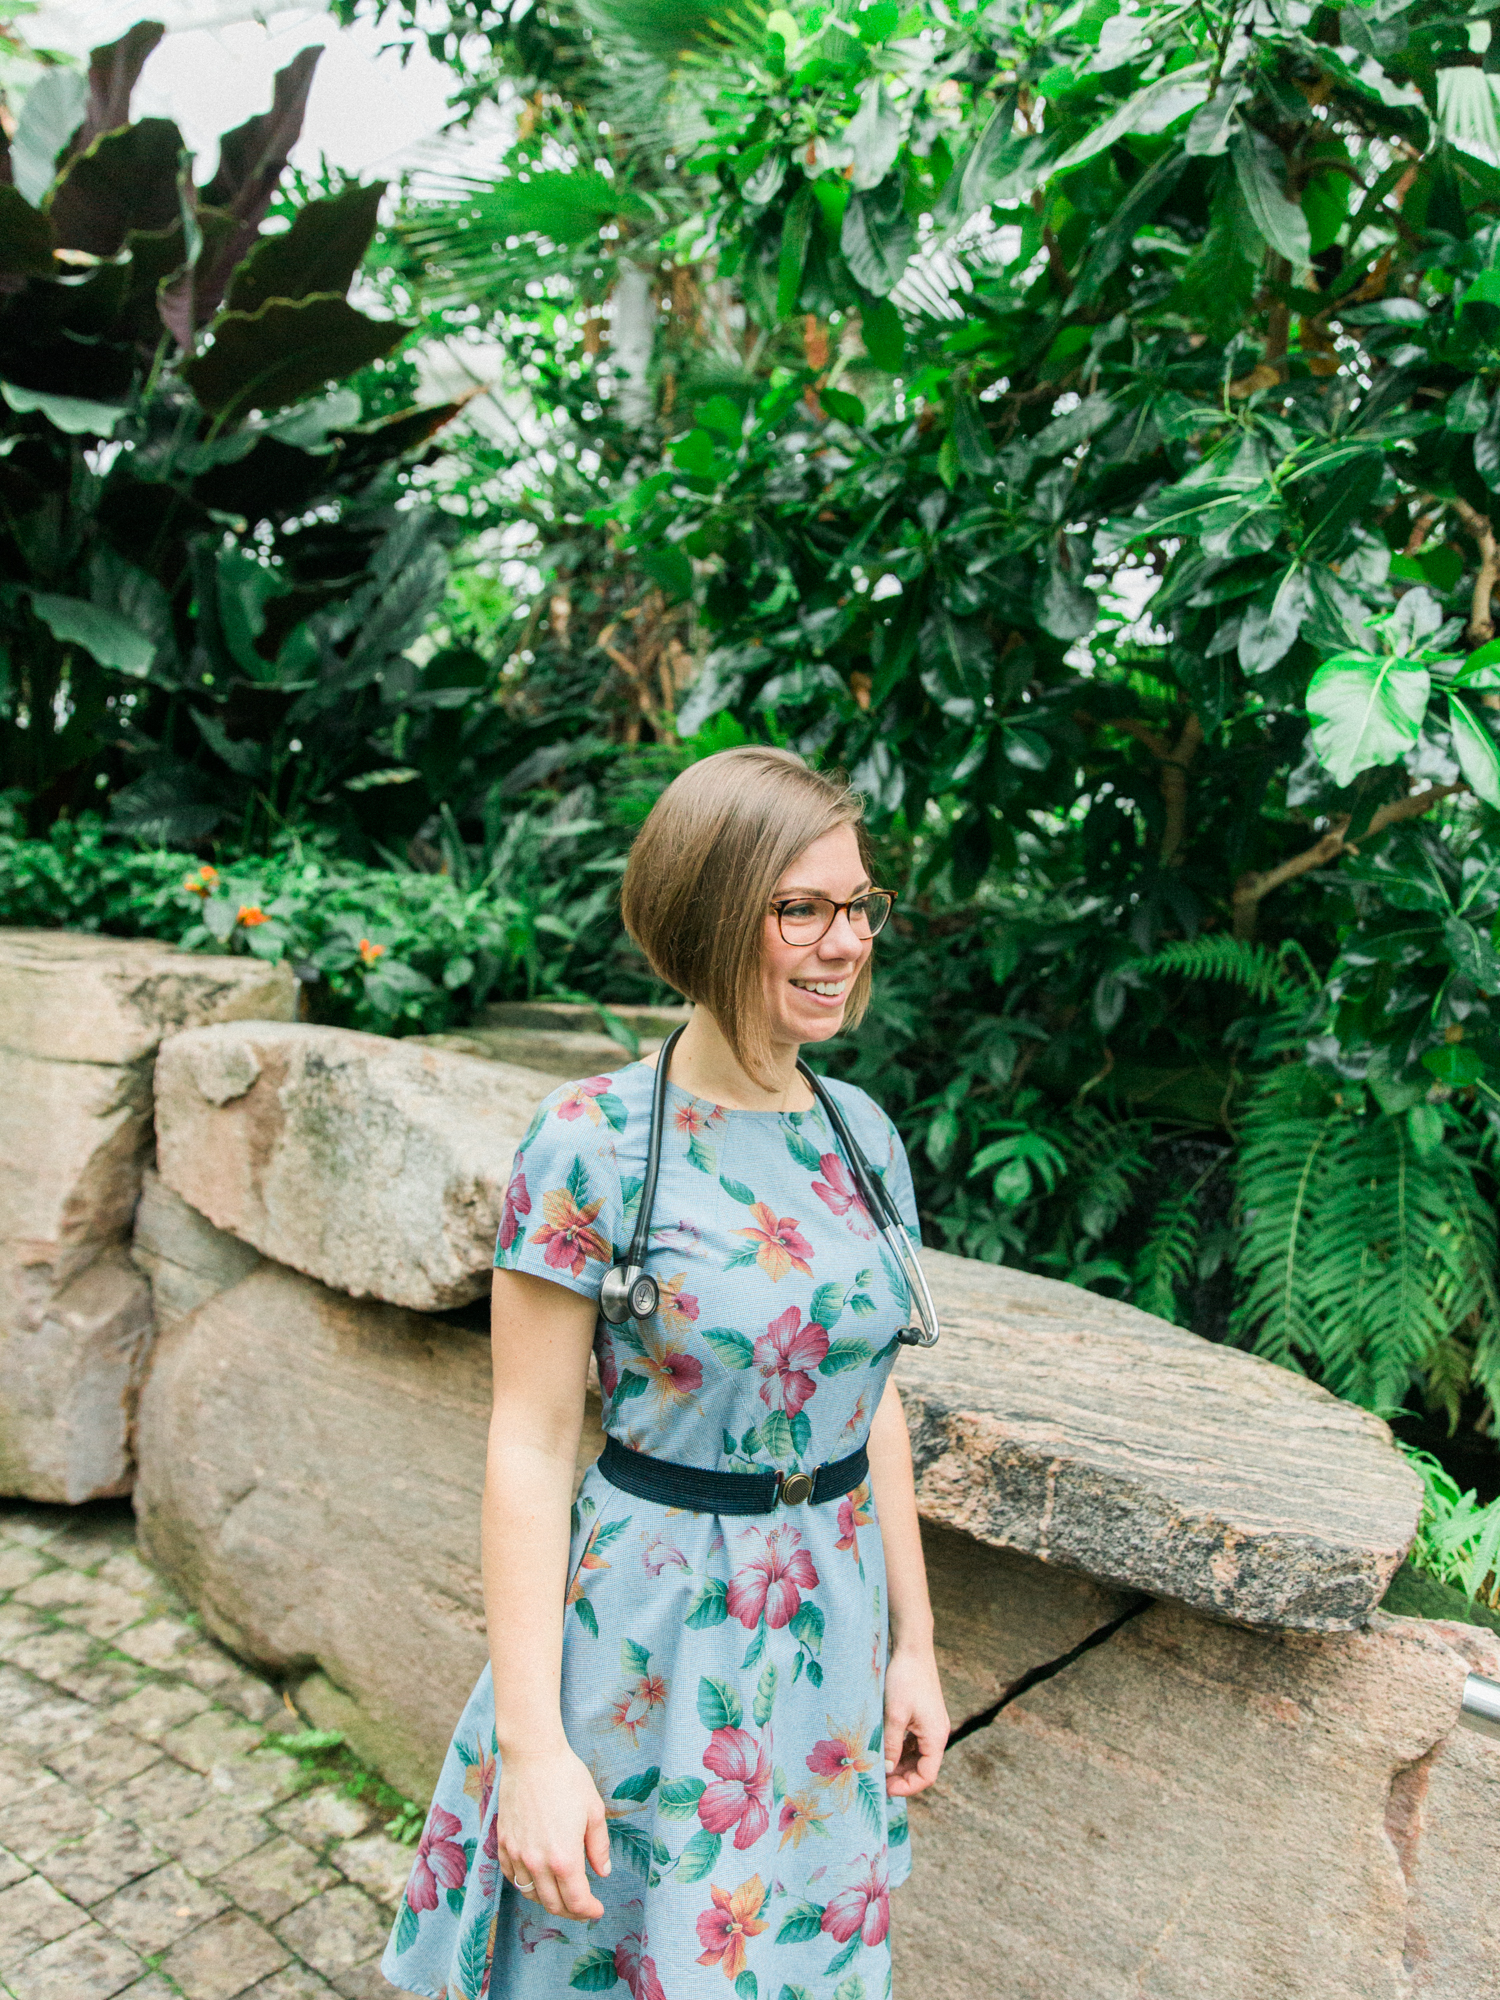 DanielleGirouxPhotography_JillianBevan_Portaits0C6A6365.jpg